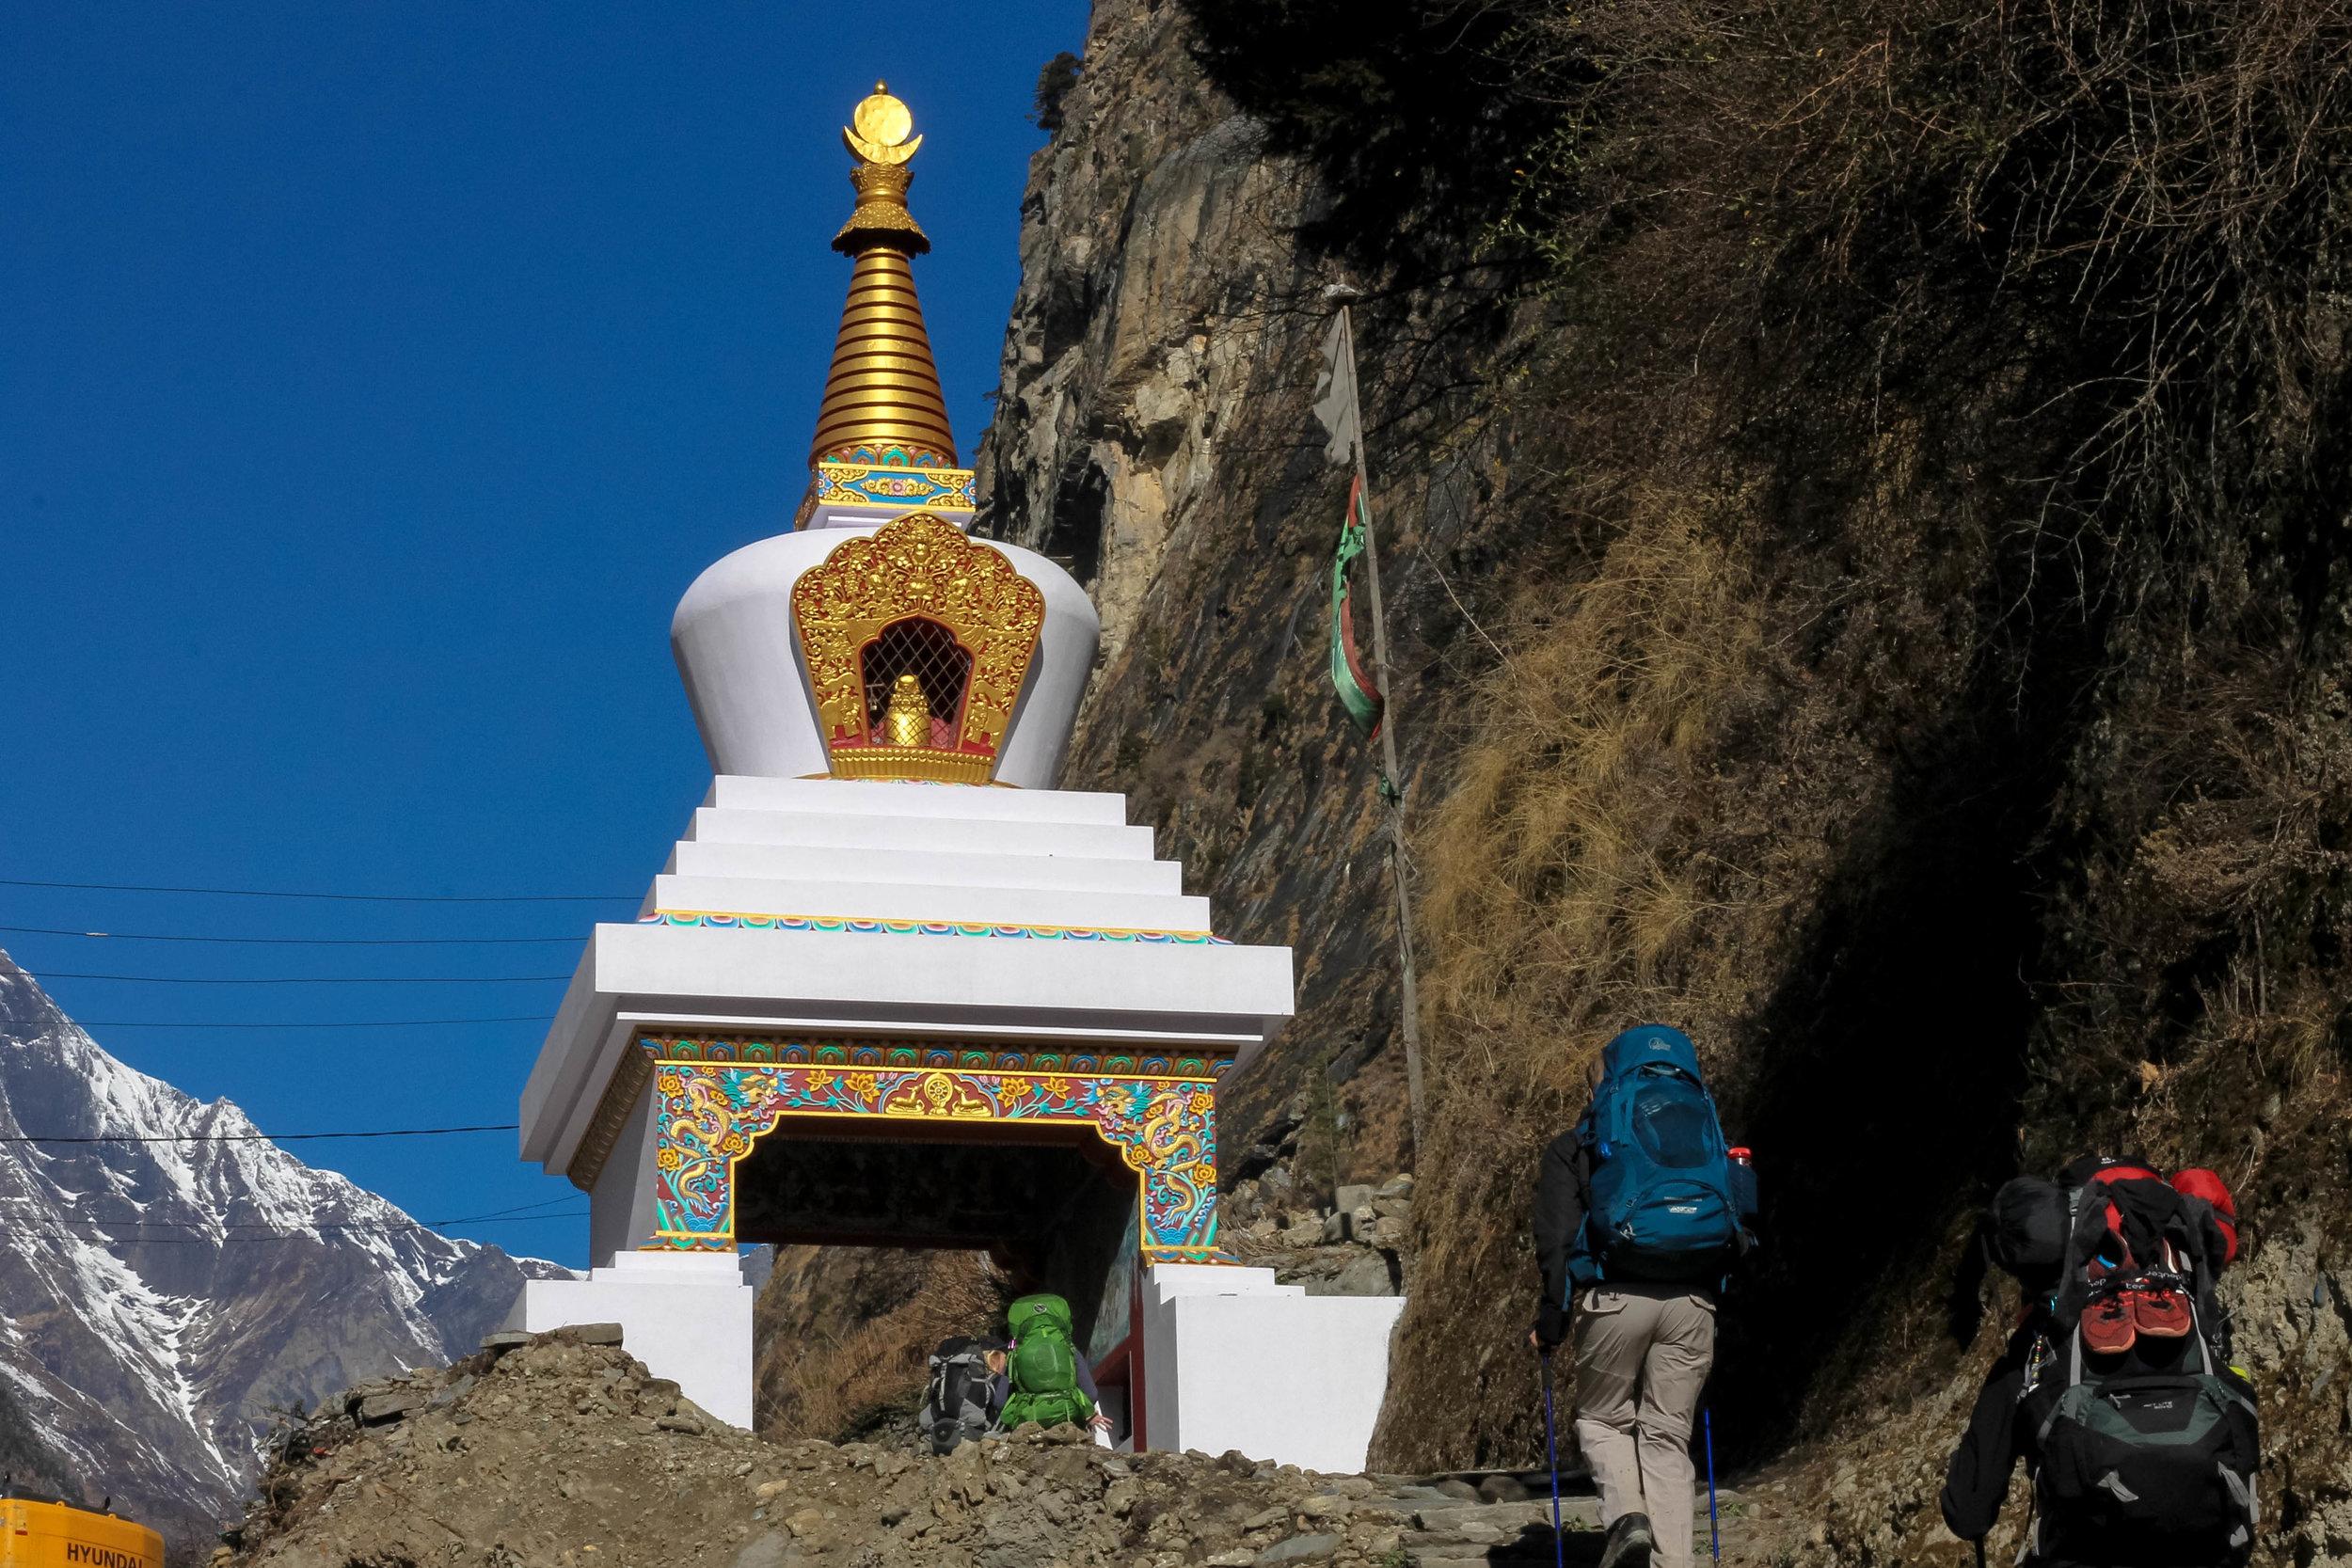 Passing through a stupa chorten (Buddhist religious monument).